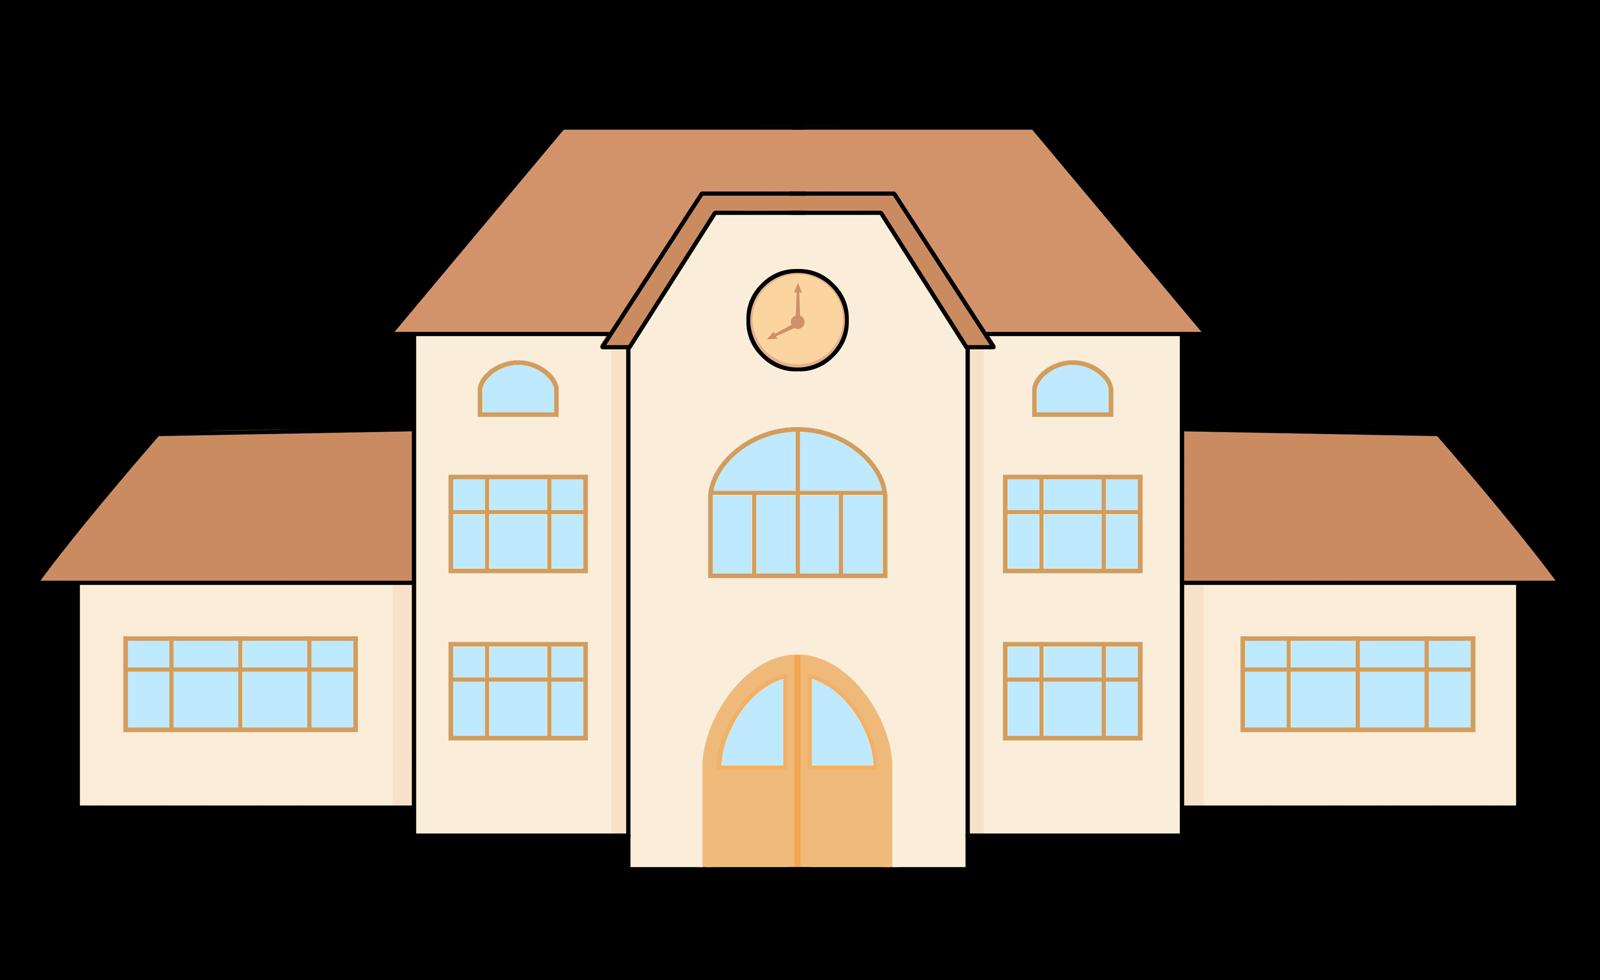 1600x980 Image Of School Building Clipart